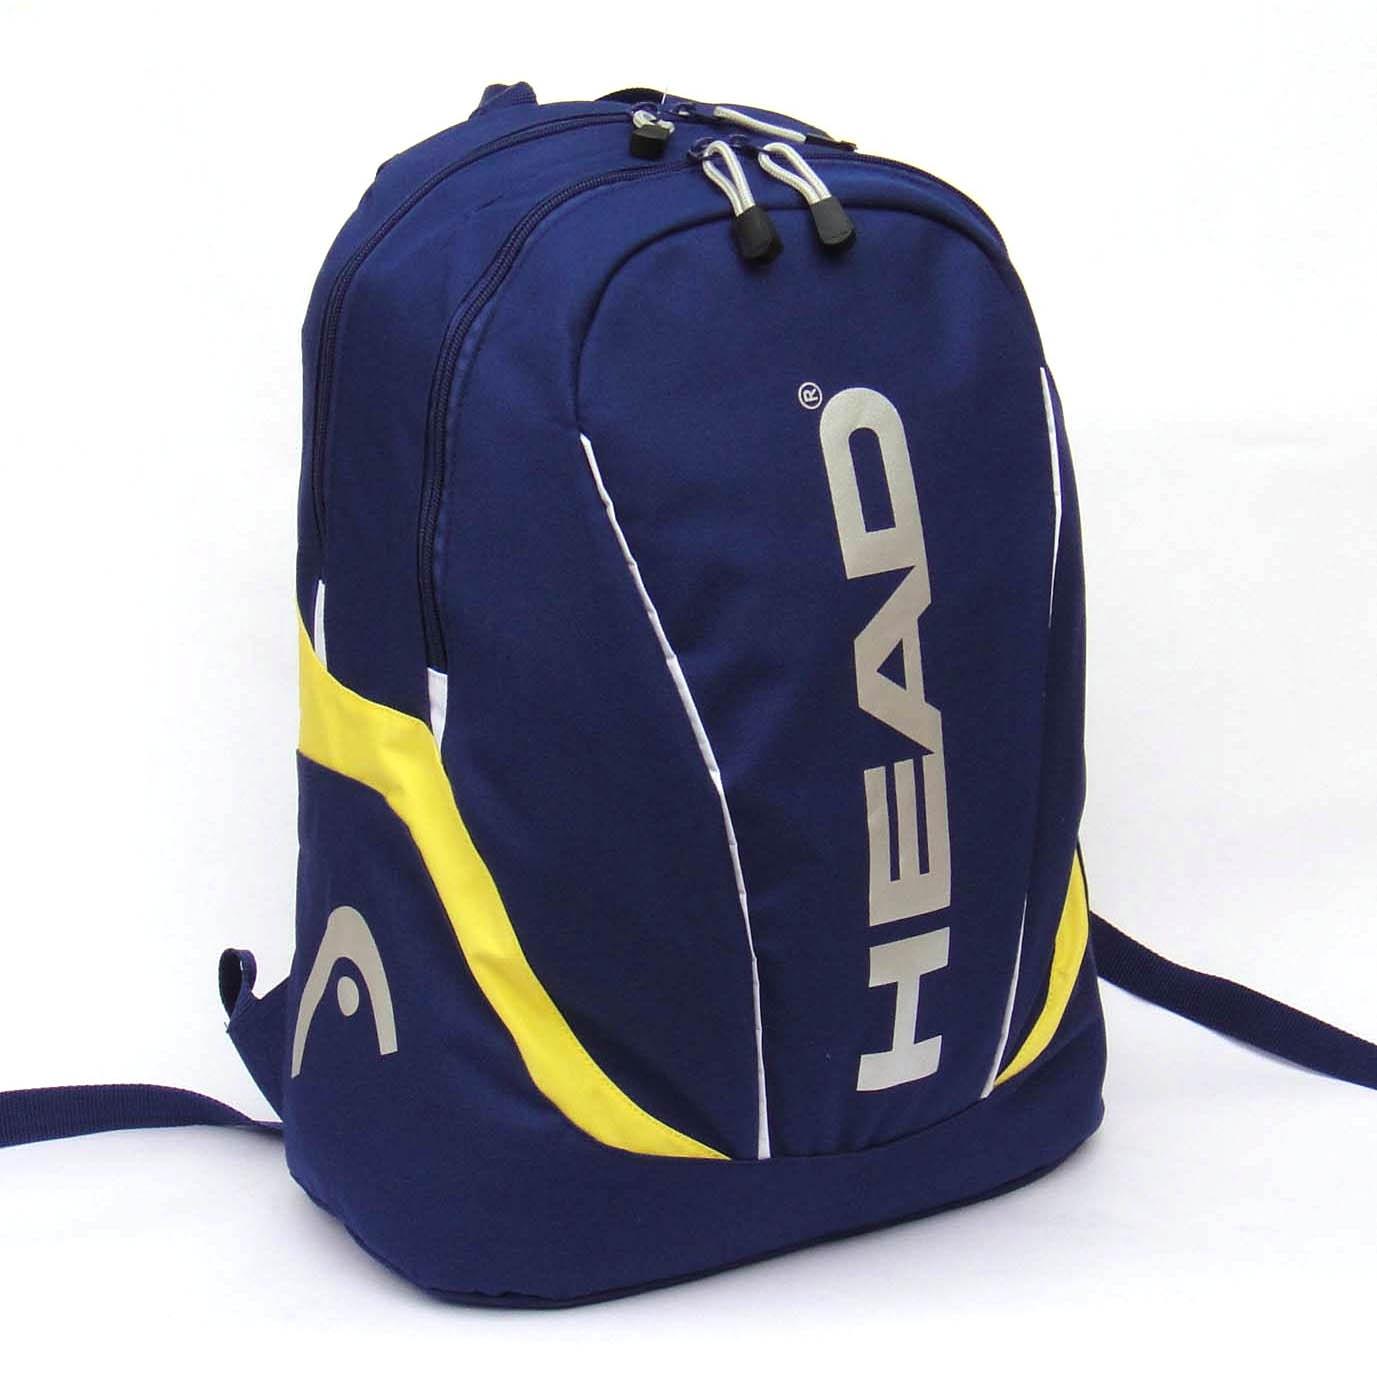 Head Centaur Backpack - Navy